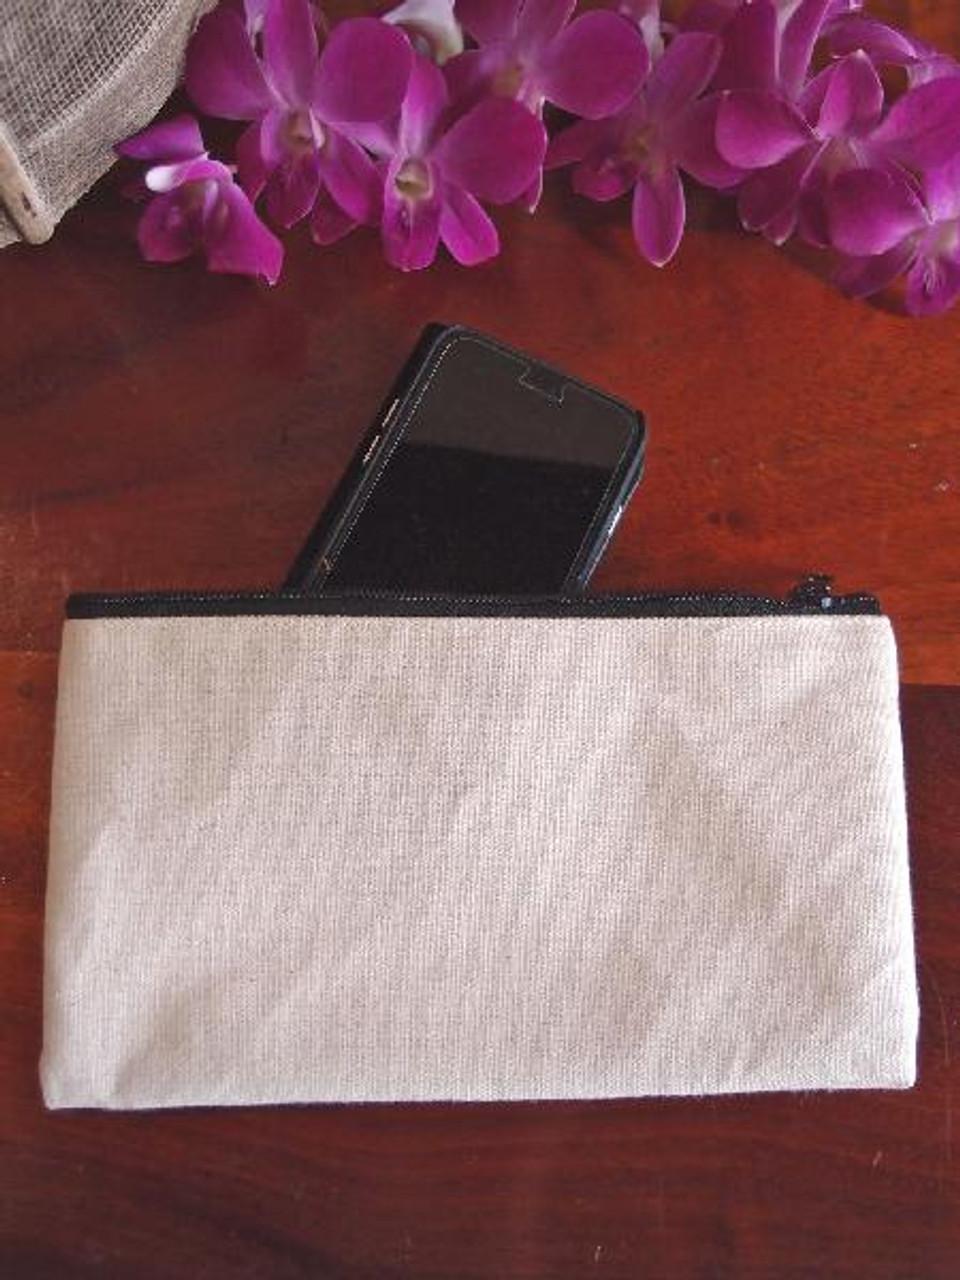 Cotton Canvas Flat Zipper Pouch Large, B694-71 | Packaging Decor